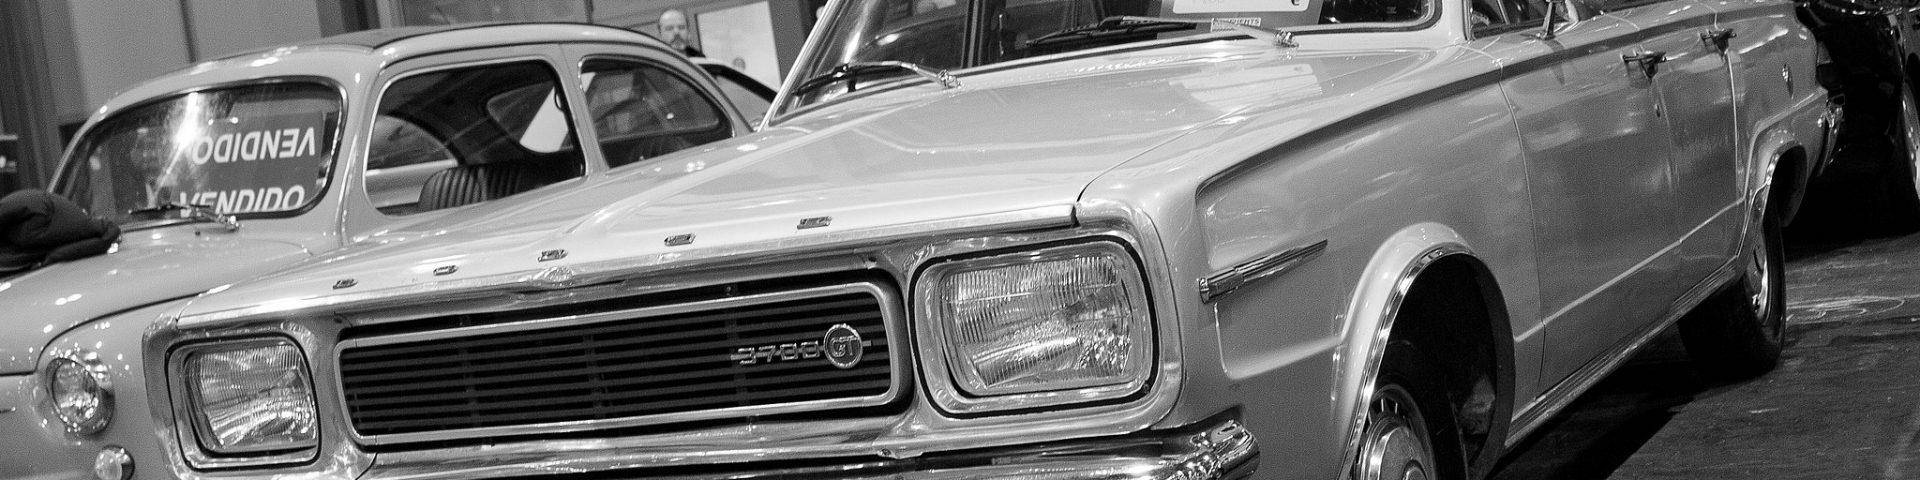 1968 Dodge Barreiros Dart 3700 GT